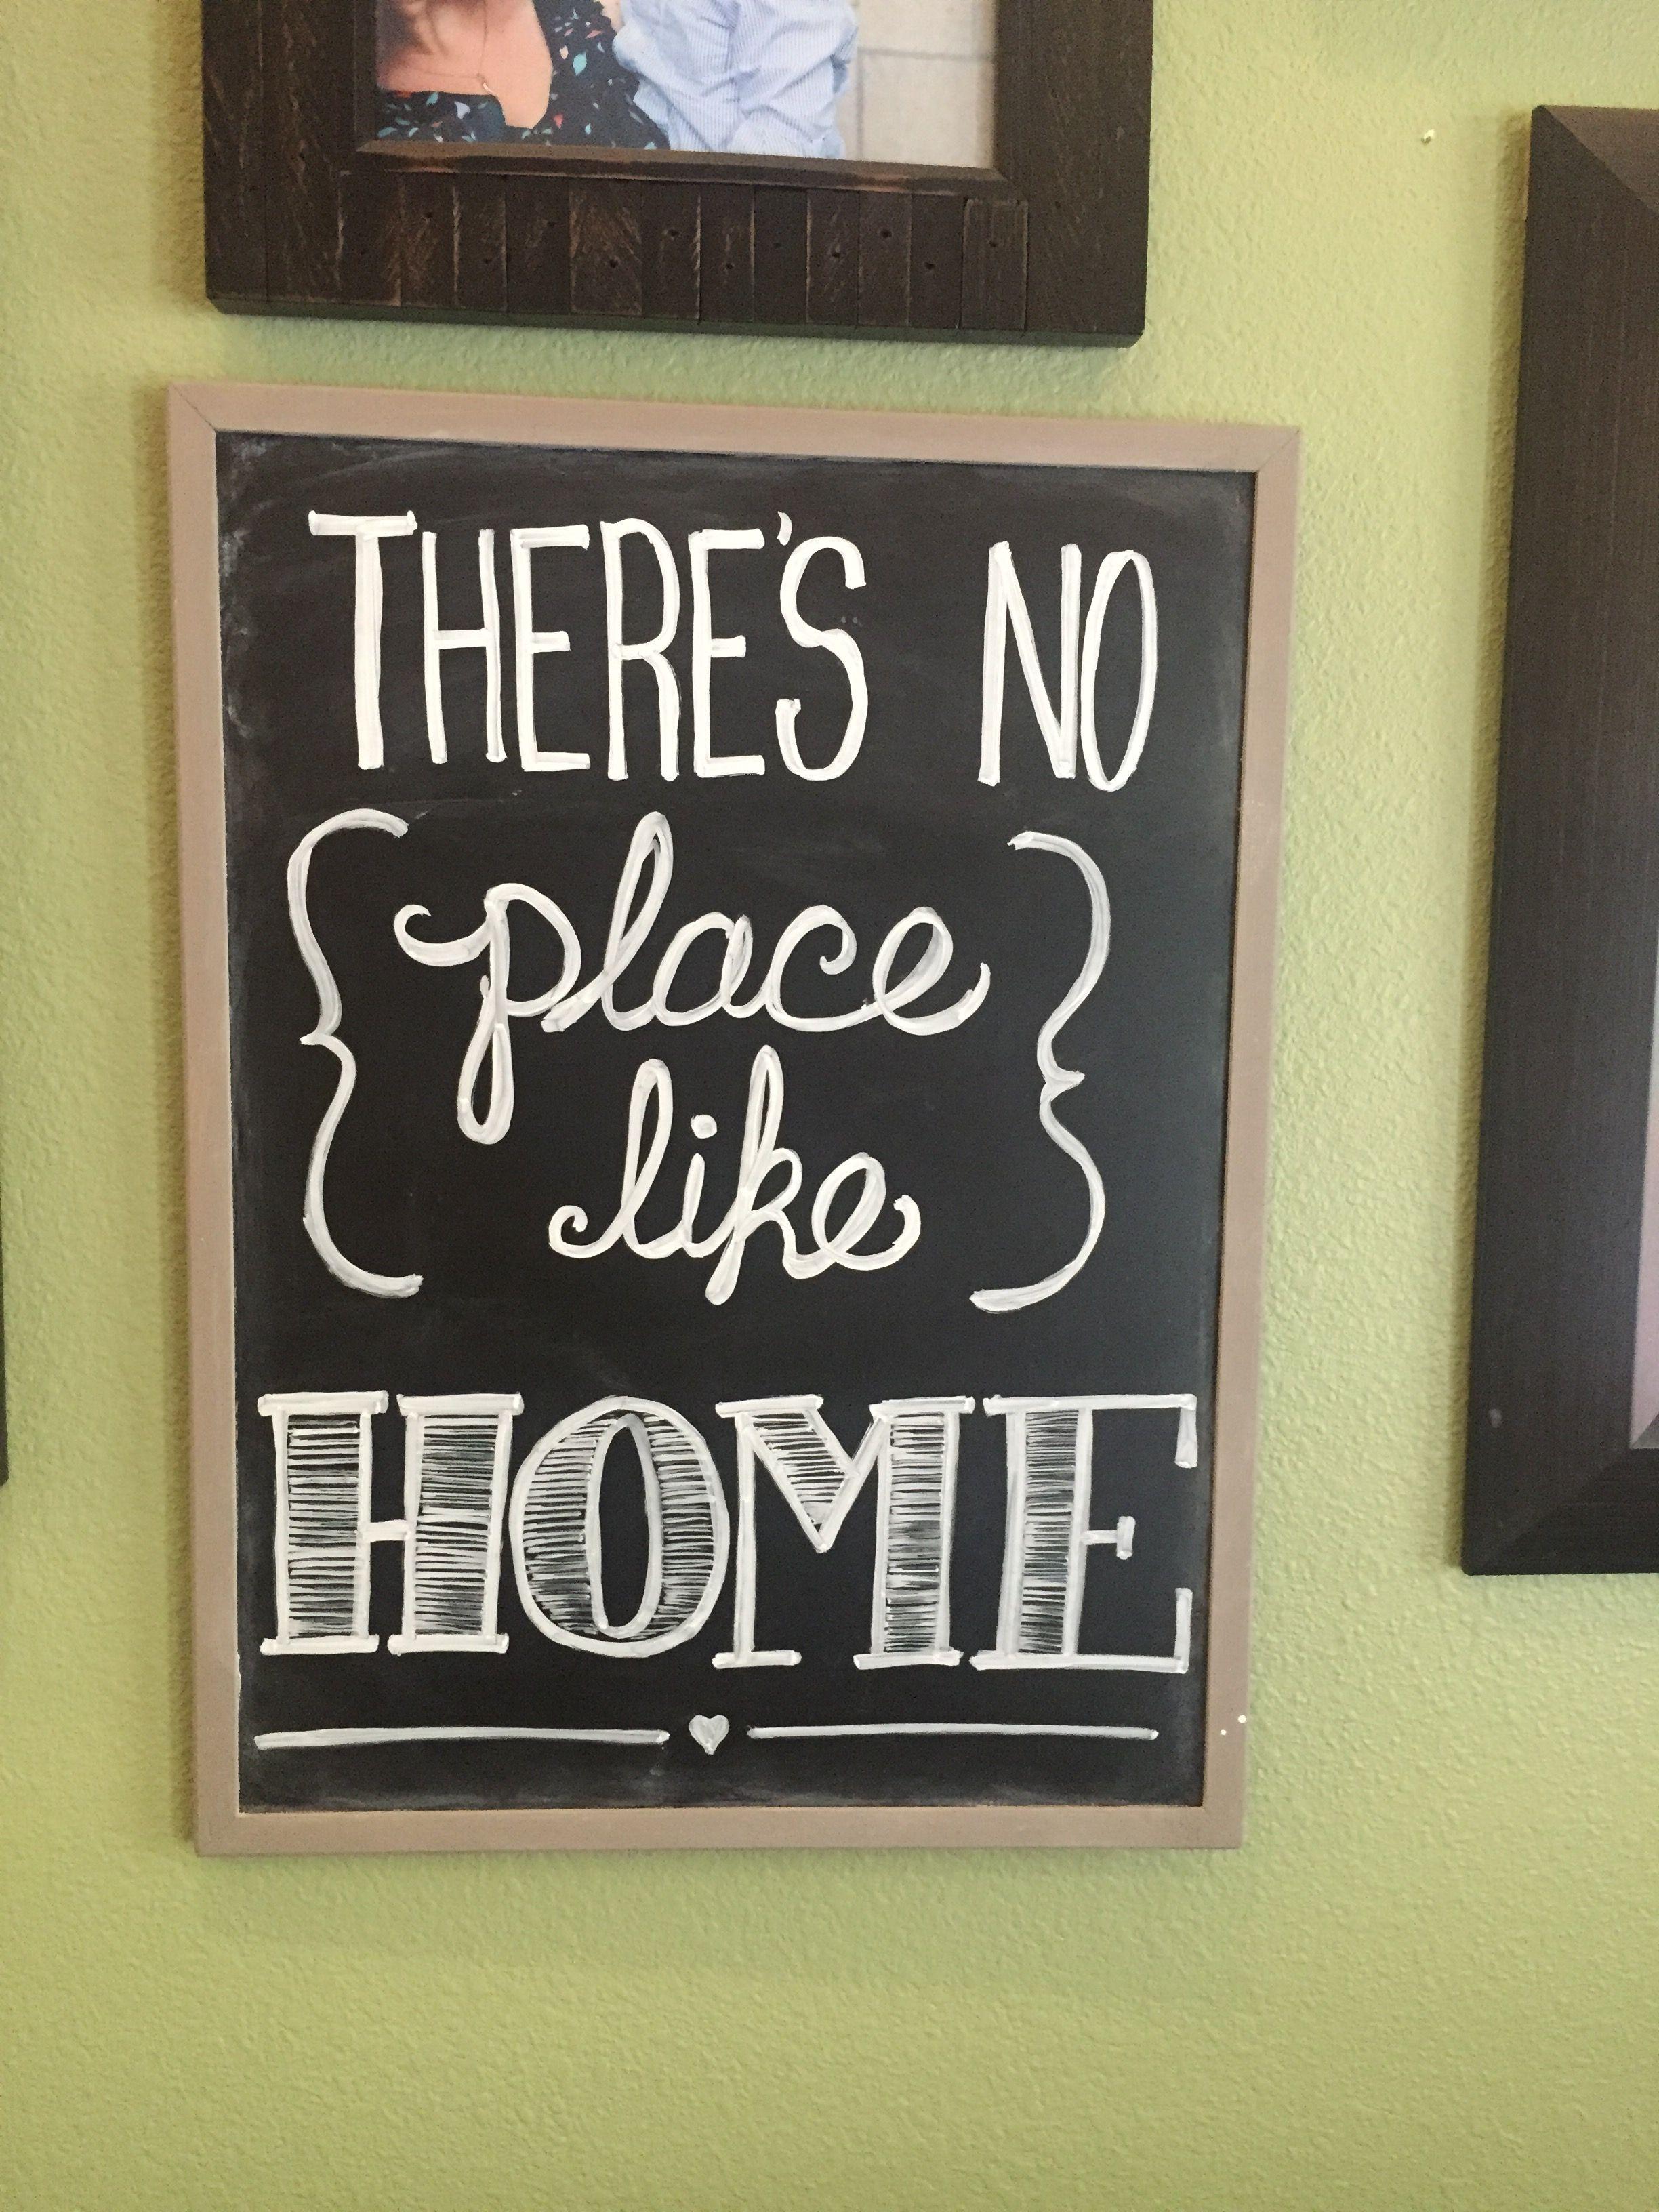 No Place Like Home Chalkboard Decor Ideas | Chalk it up | Pinterest ...